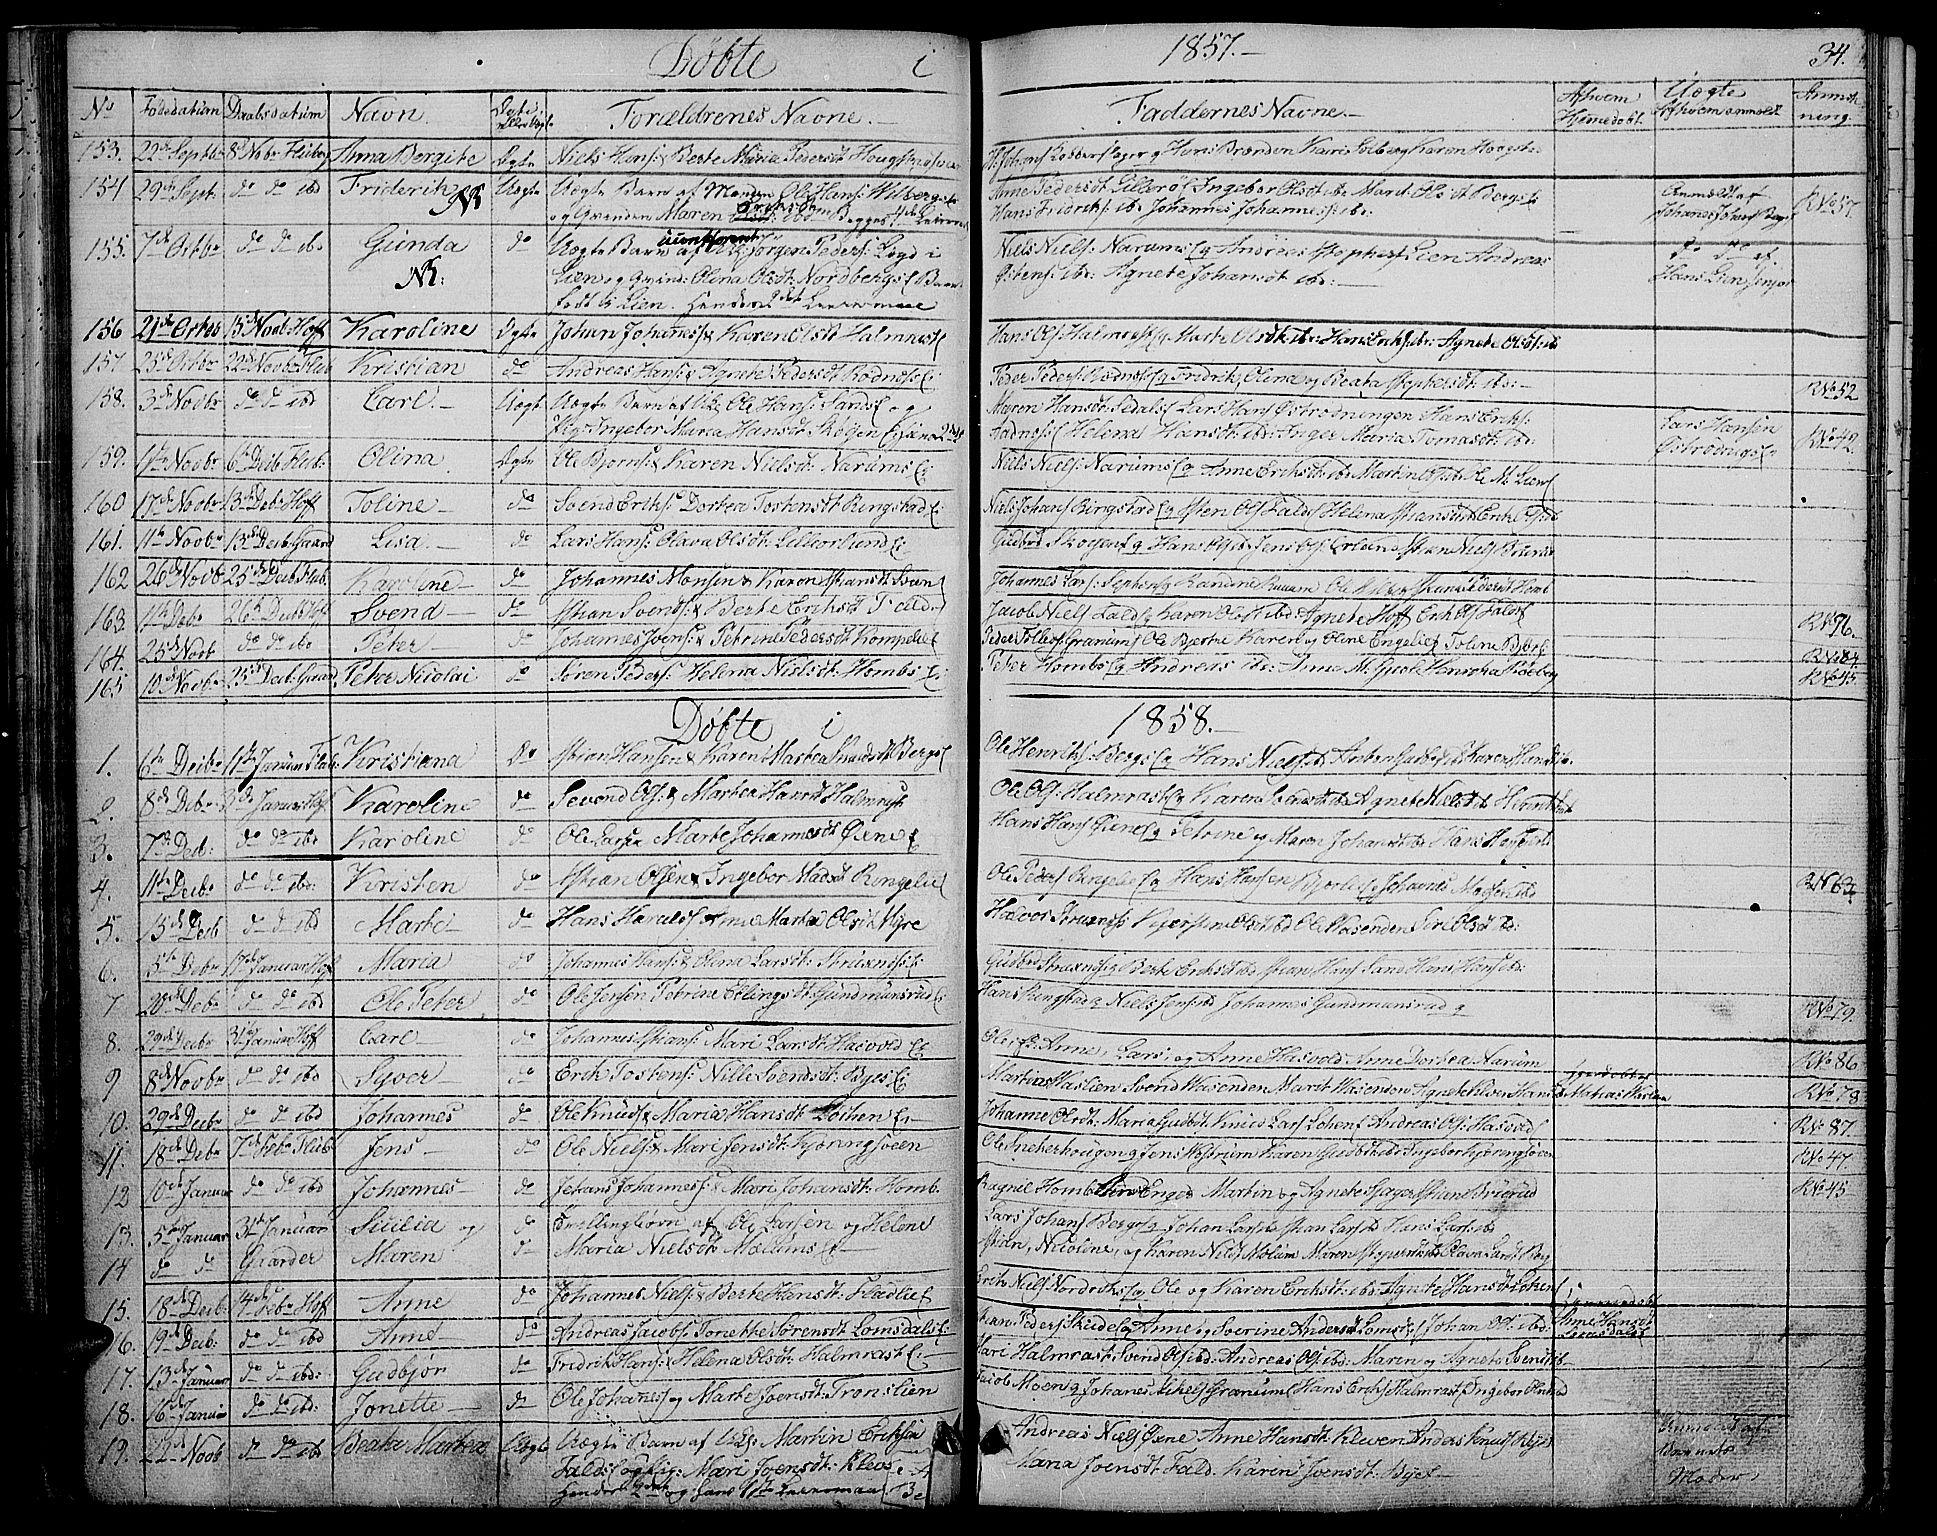 SAH, Søndre Land prestekontor, L/L0001: Klokkerbok nr. 1, 1849-1883, s. 34